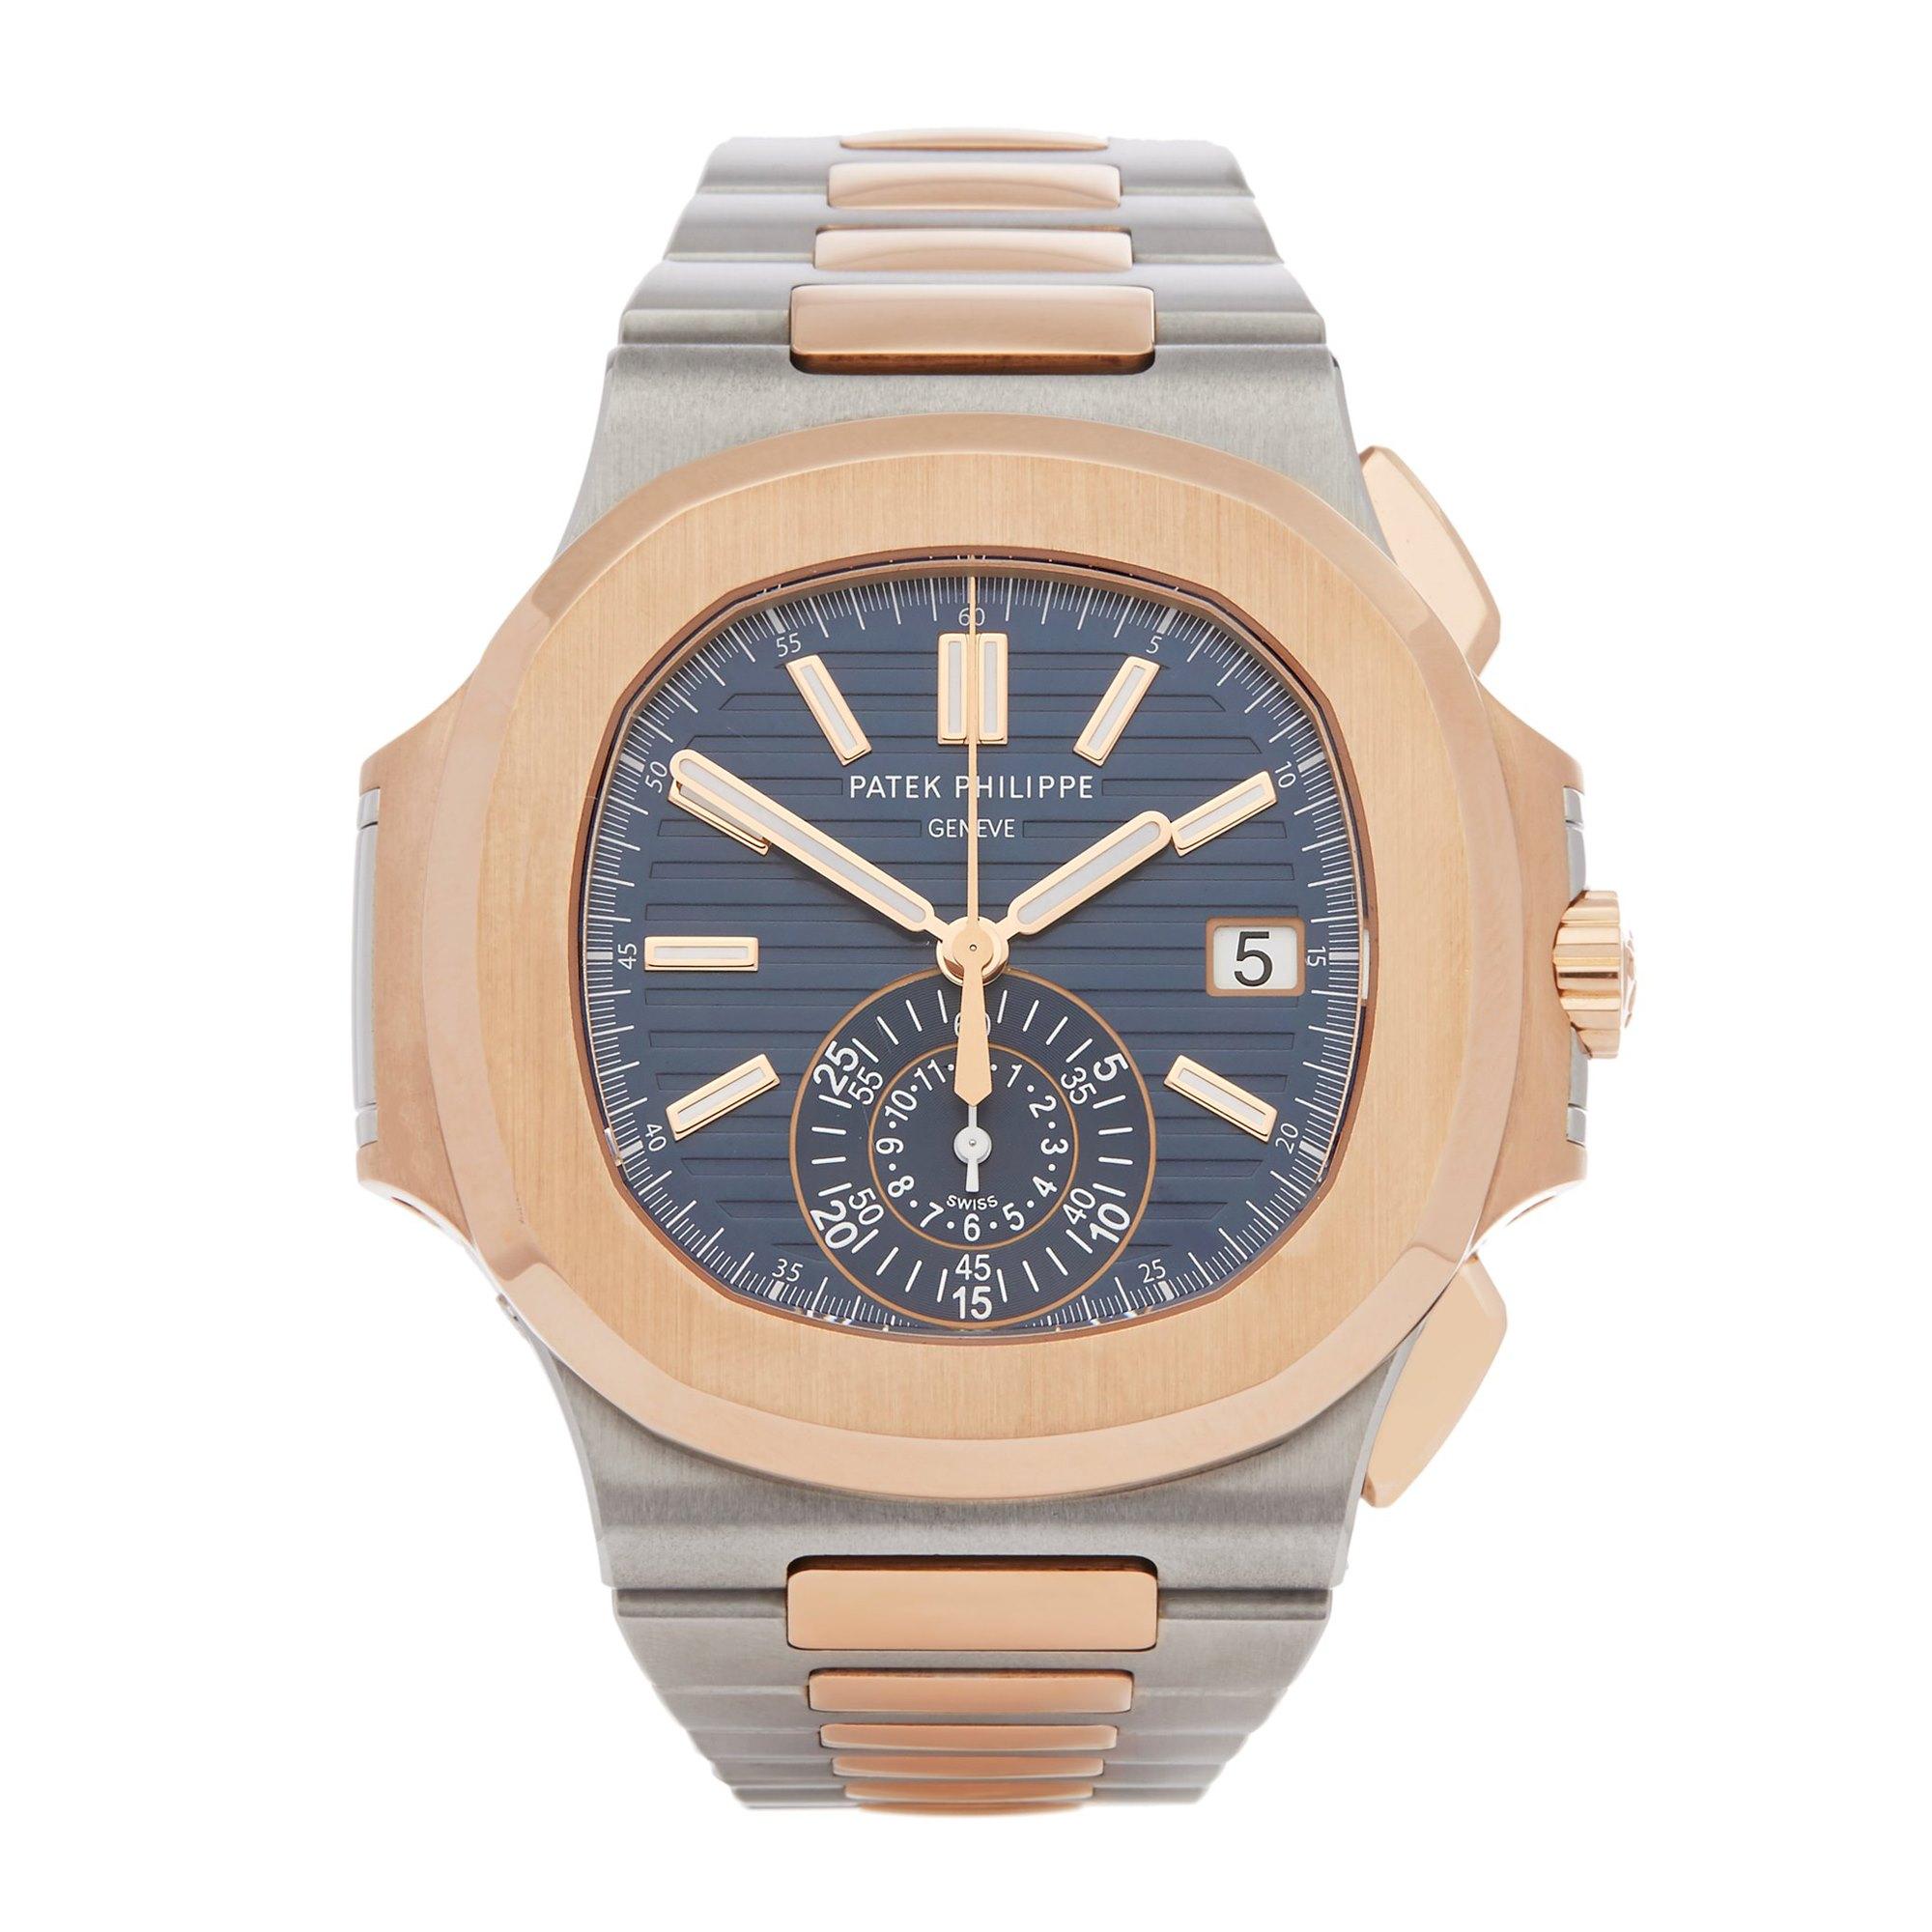 Patek Philippe Nautilus Chronograph Stainless Steel & Rose Gold 5980/1AR-001